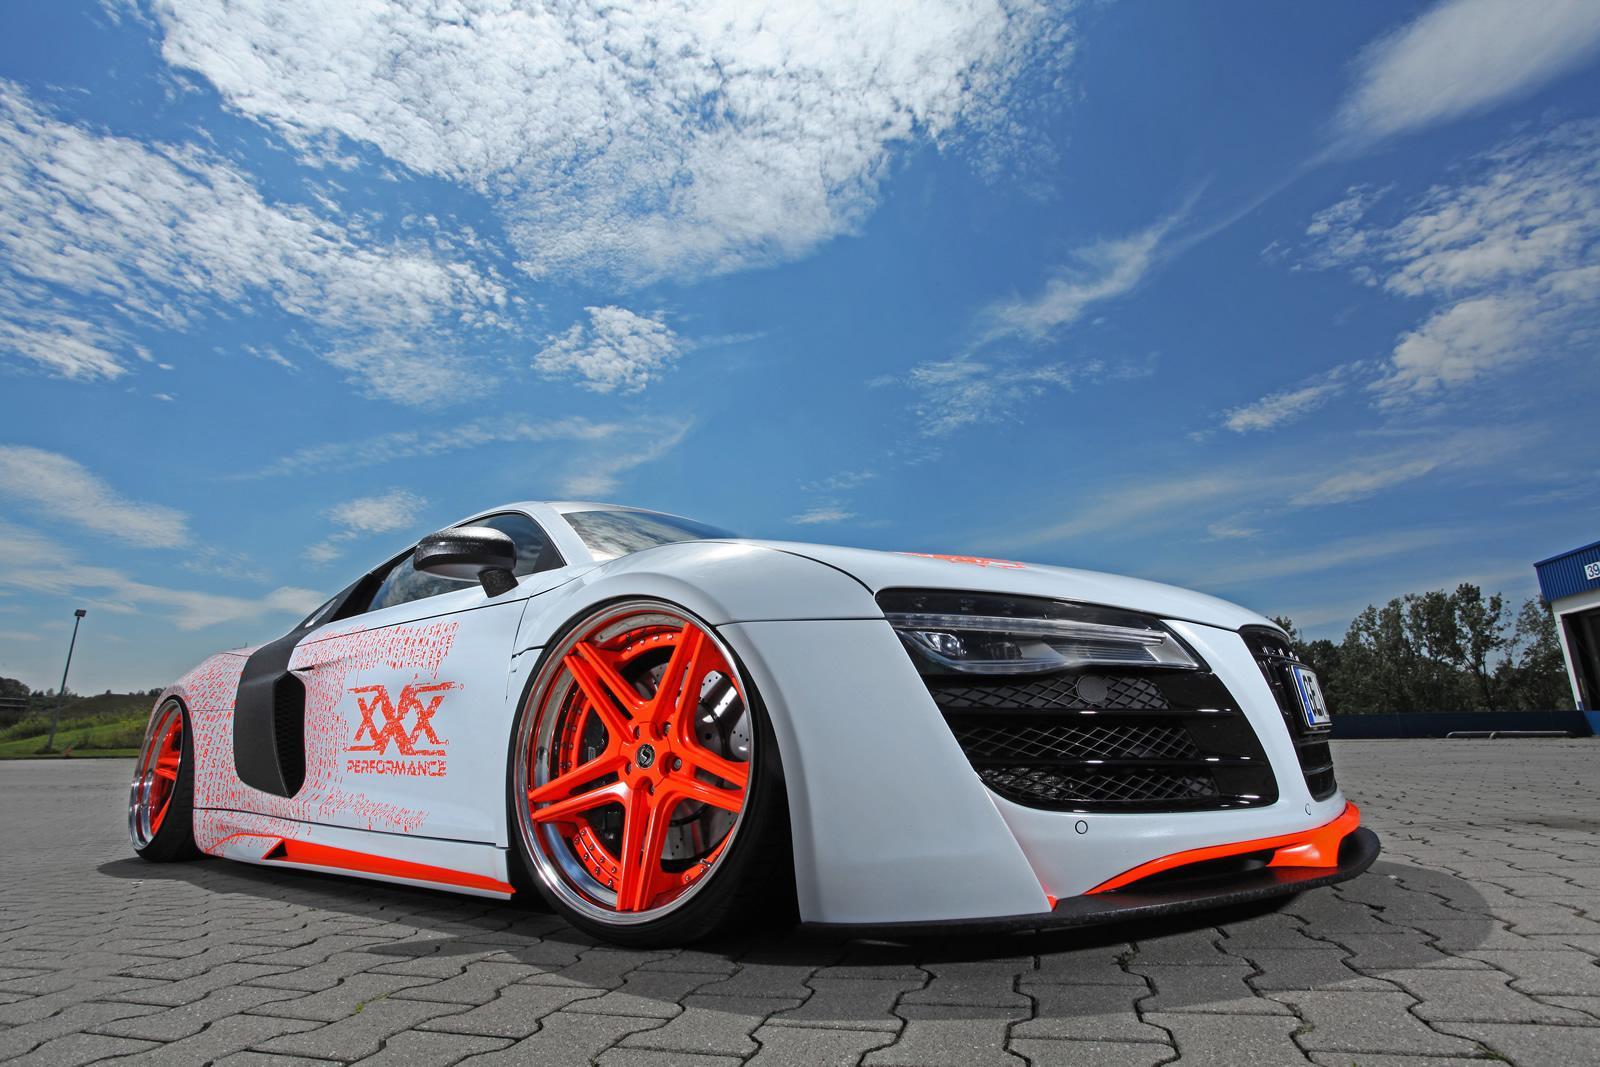 Cadillac Ats V Coupe >> 2014 Audi R8 Gets Killer Slammed Look from xXx Performance ...